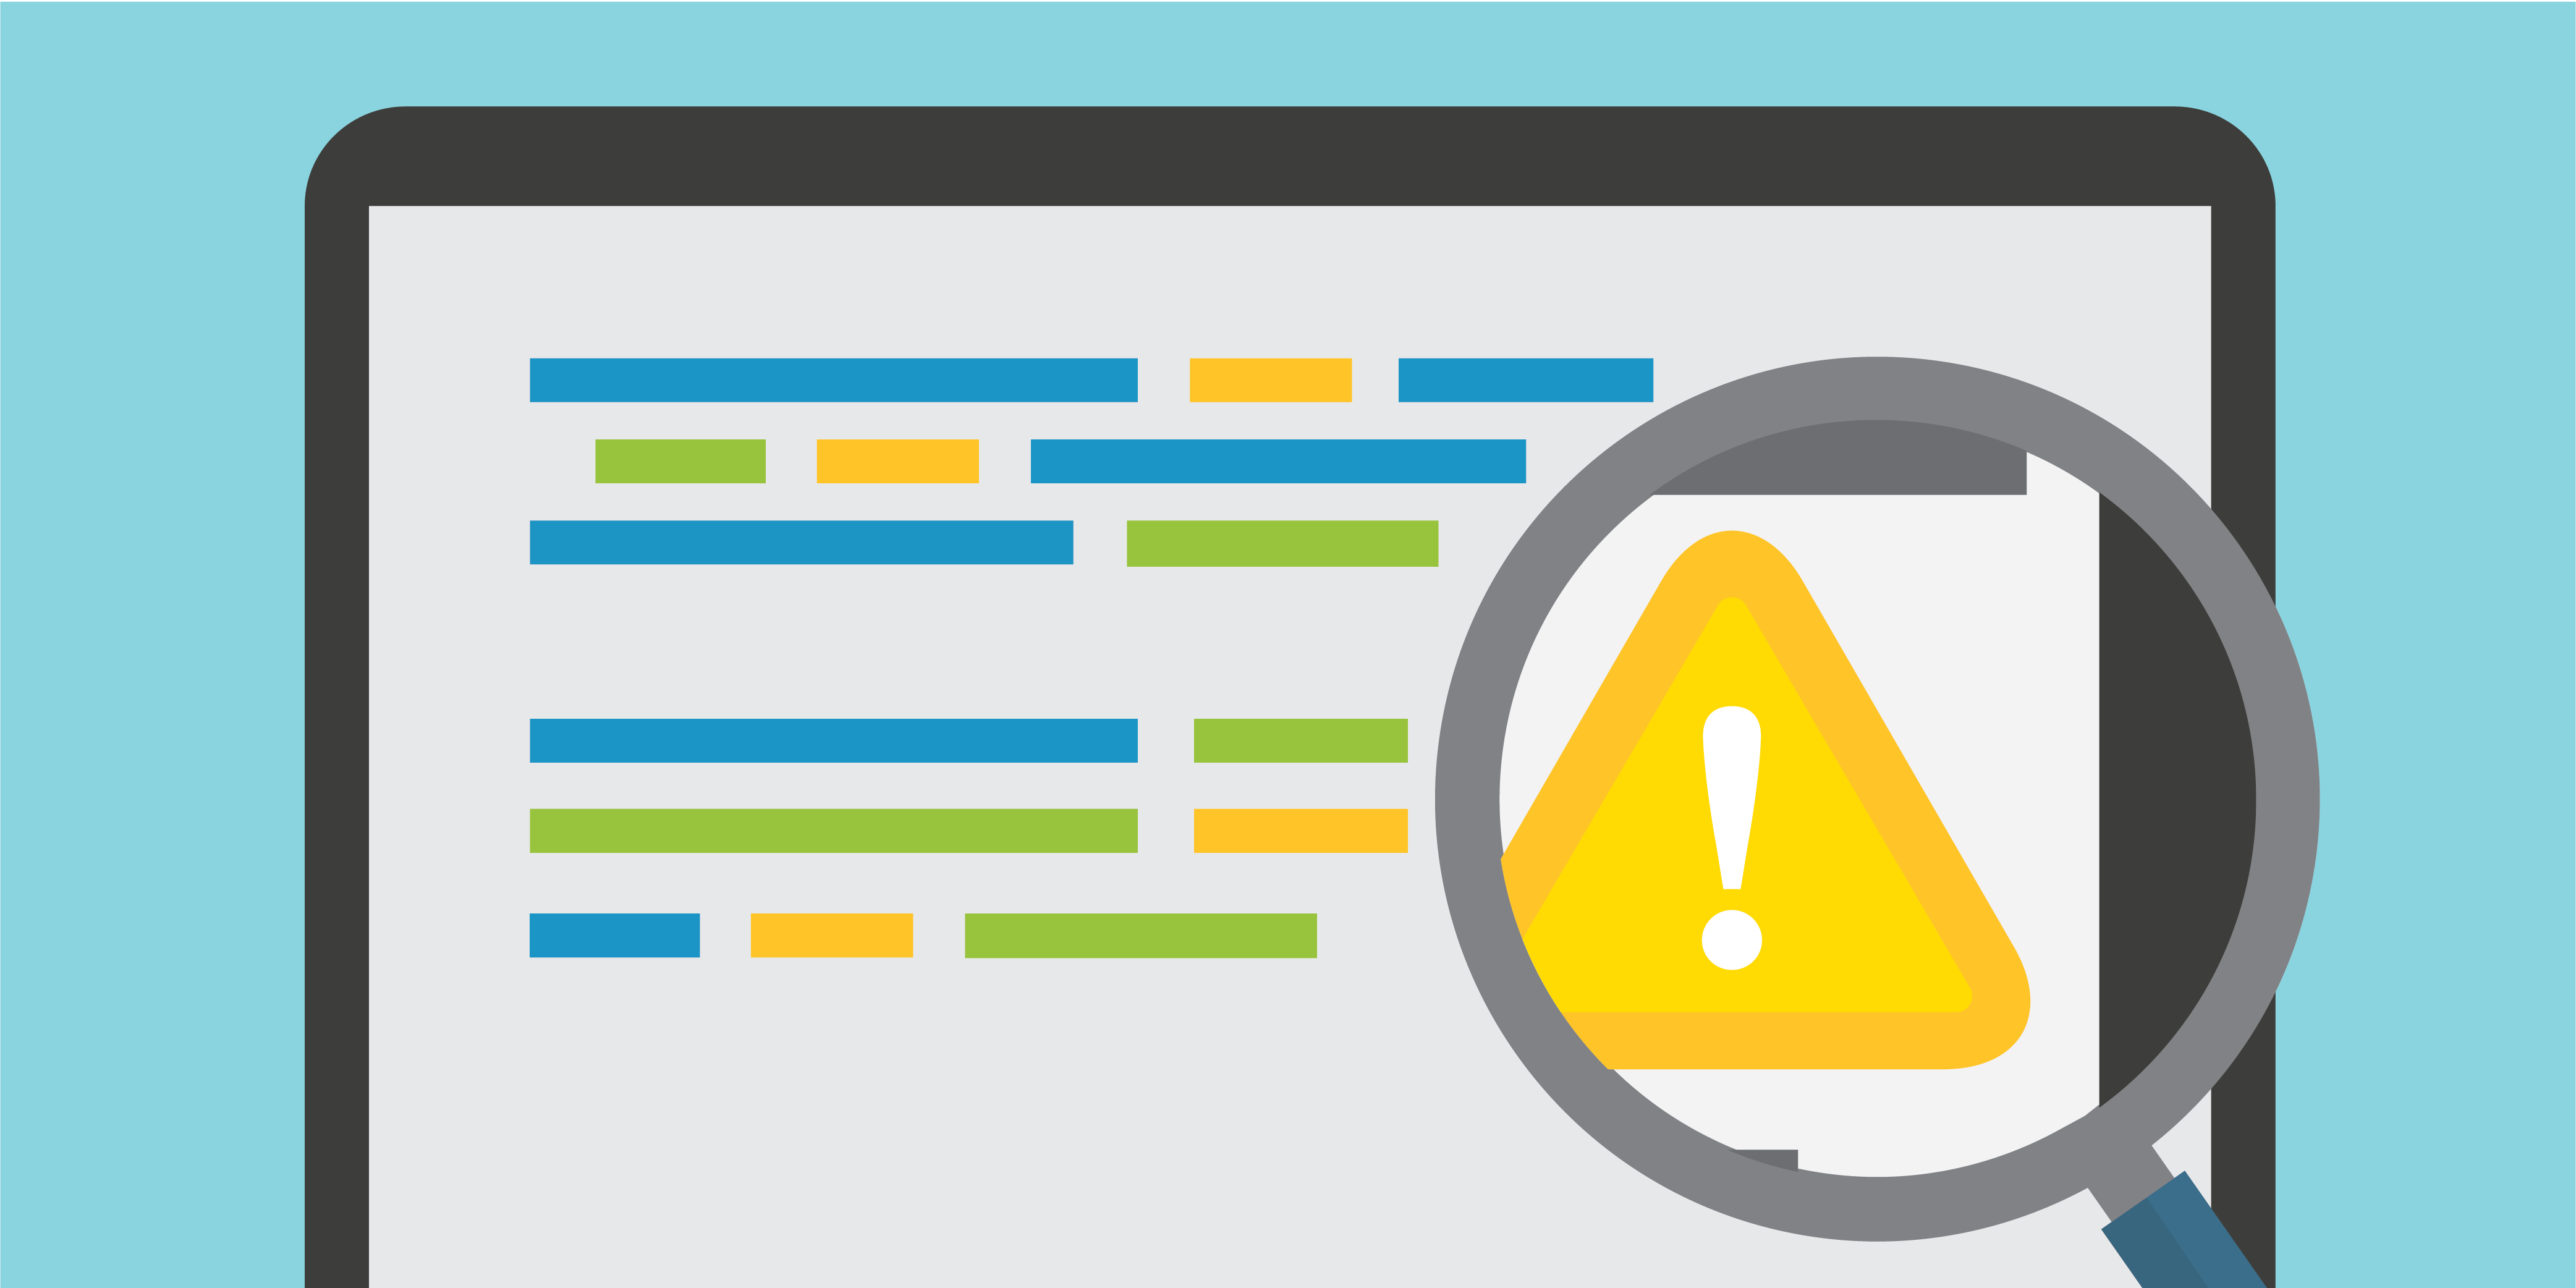 Unit 42 Discovers 10 New Microsoft Vulnerabilities